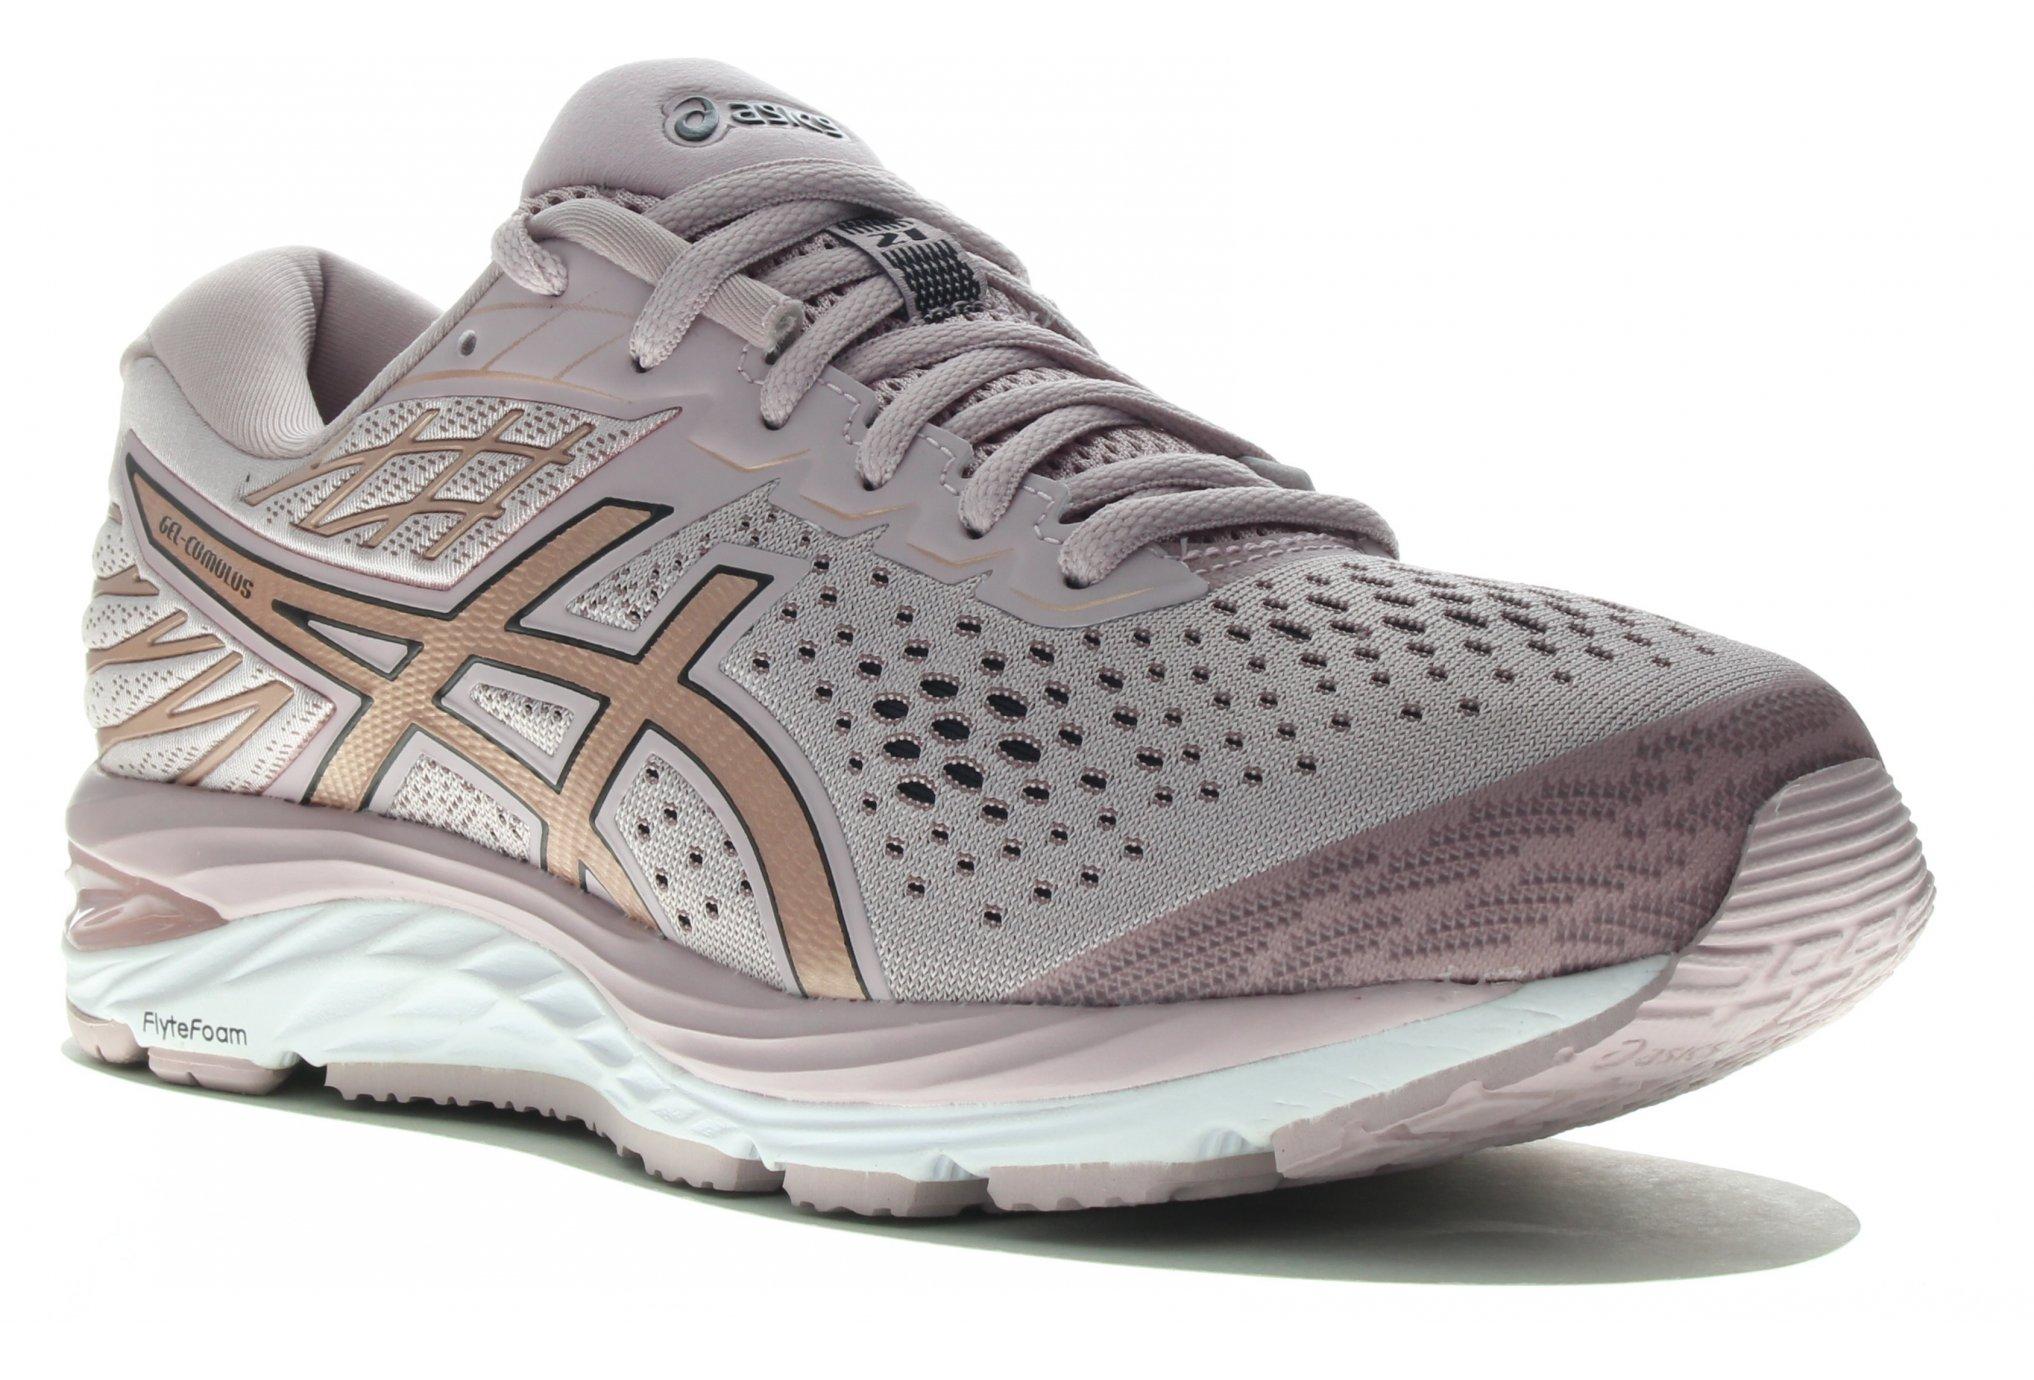 Asics Gel-Cumulus 21 Chaussures running femme